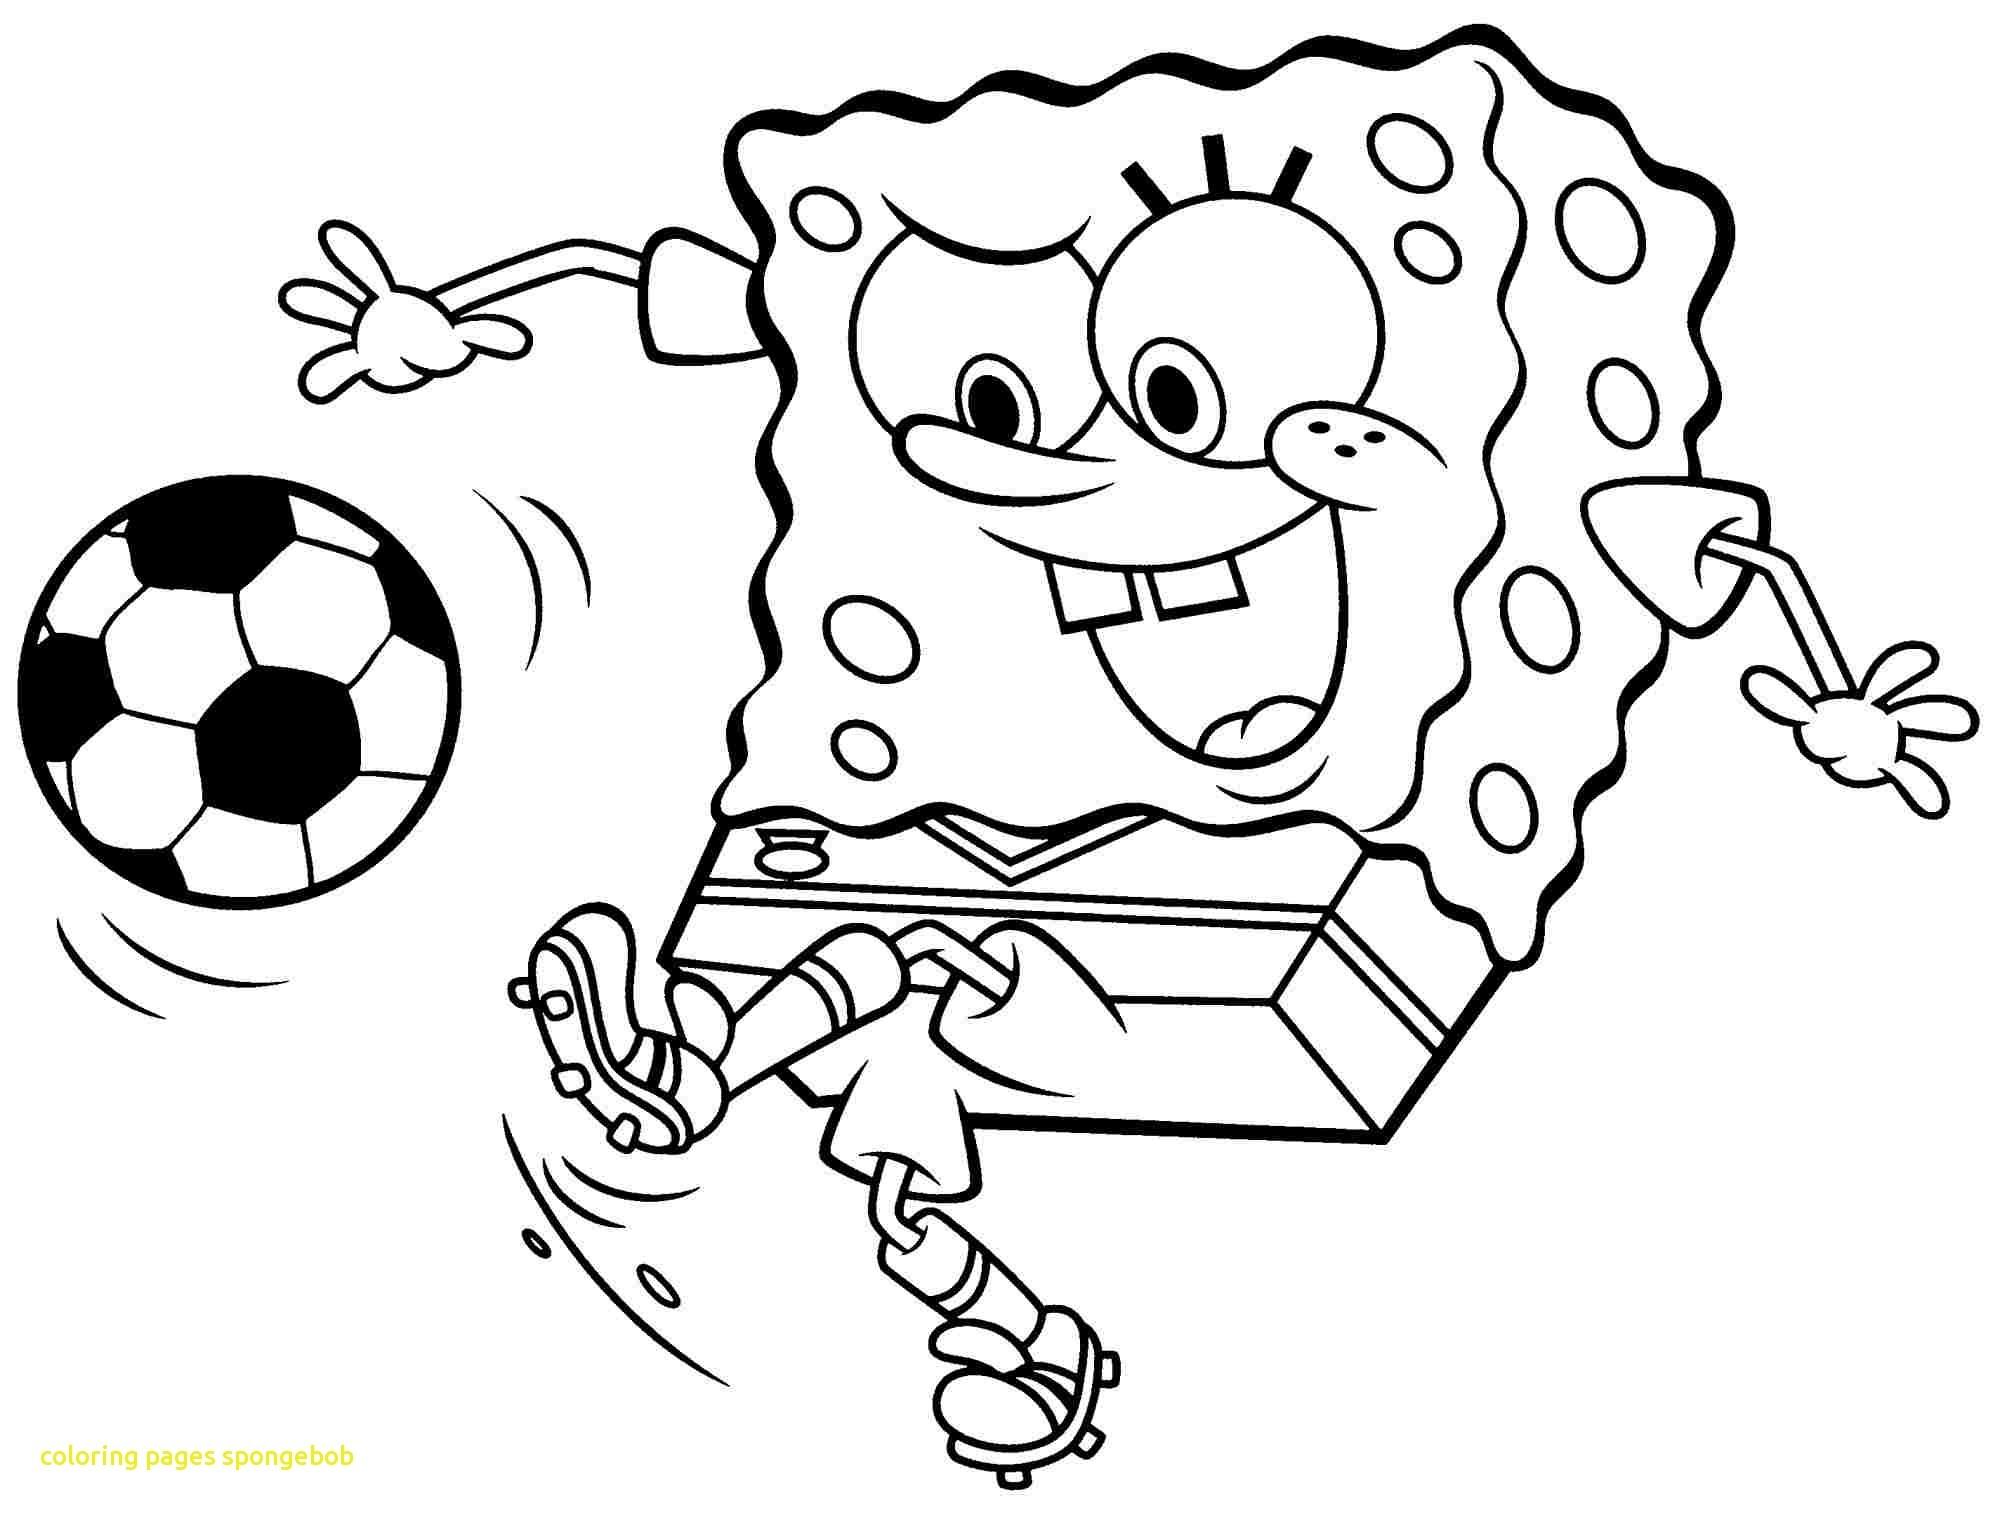 2000x1513 Spongebob Squarepants Coloring Pages Free Printable Coloring Page